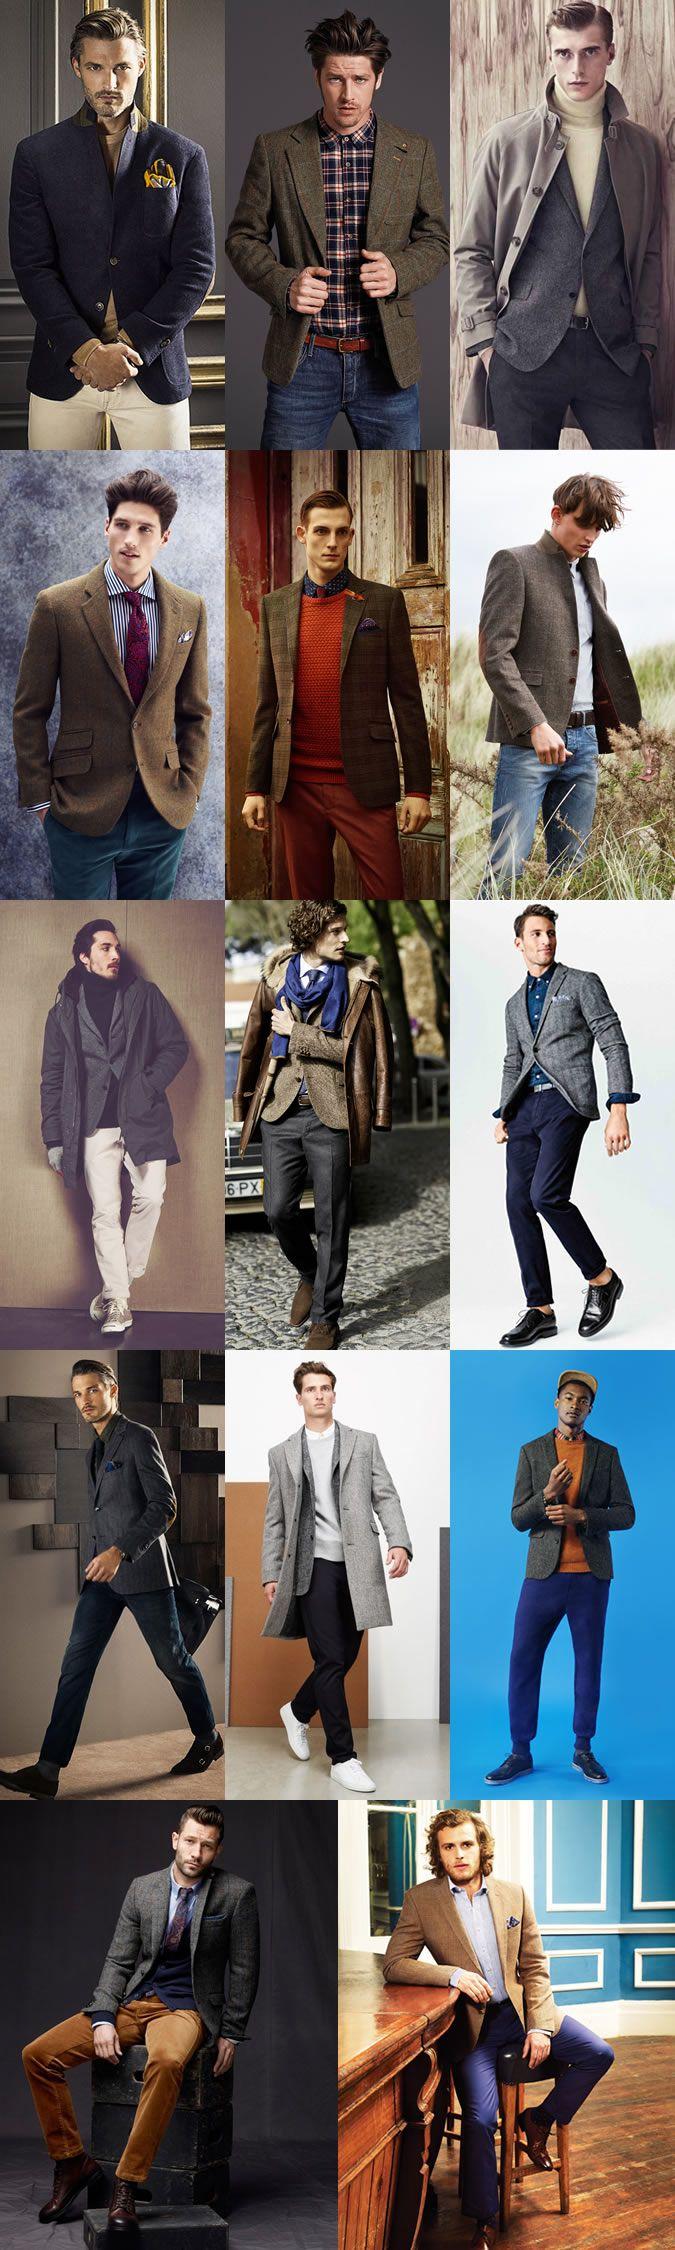 Men's Autumn/Winter Essential Fabrics: Tweed as The Tweed Blazer Lookbook Inspiration